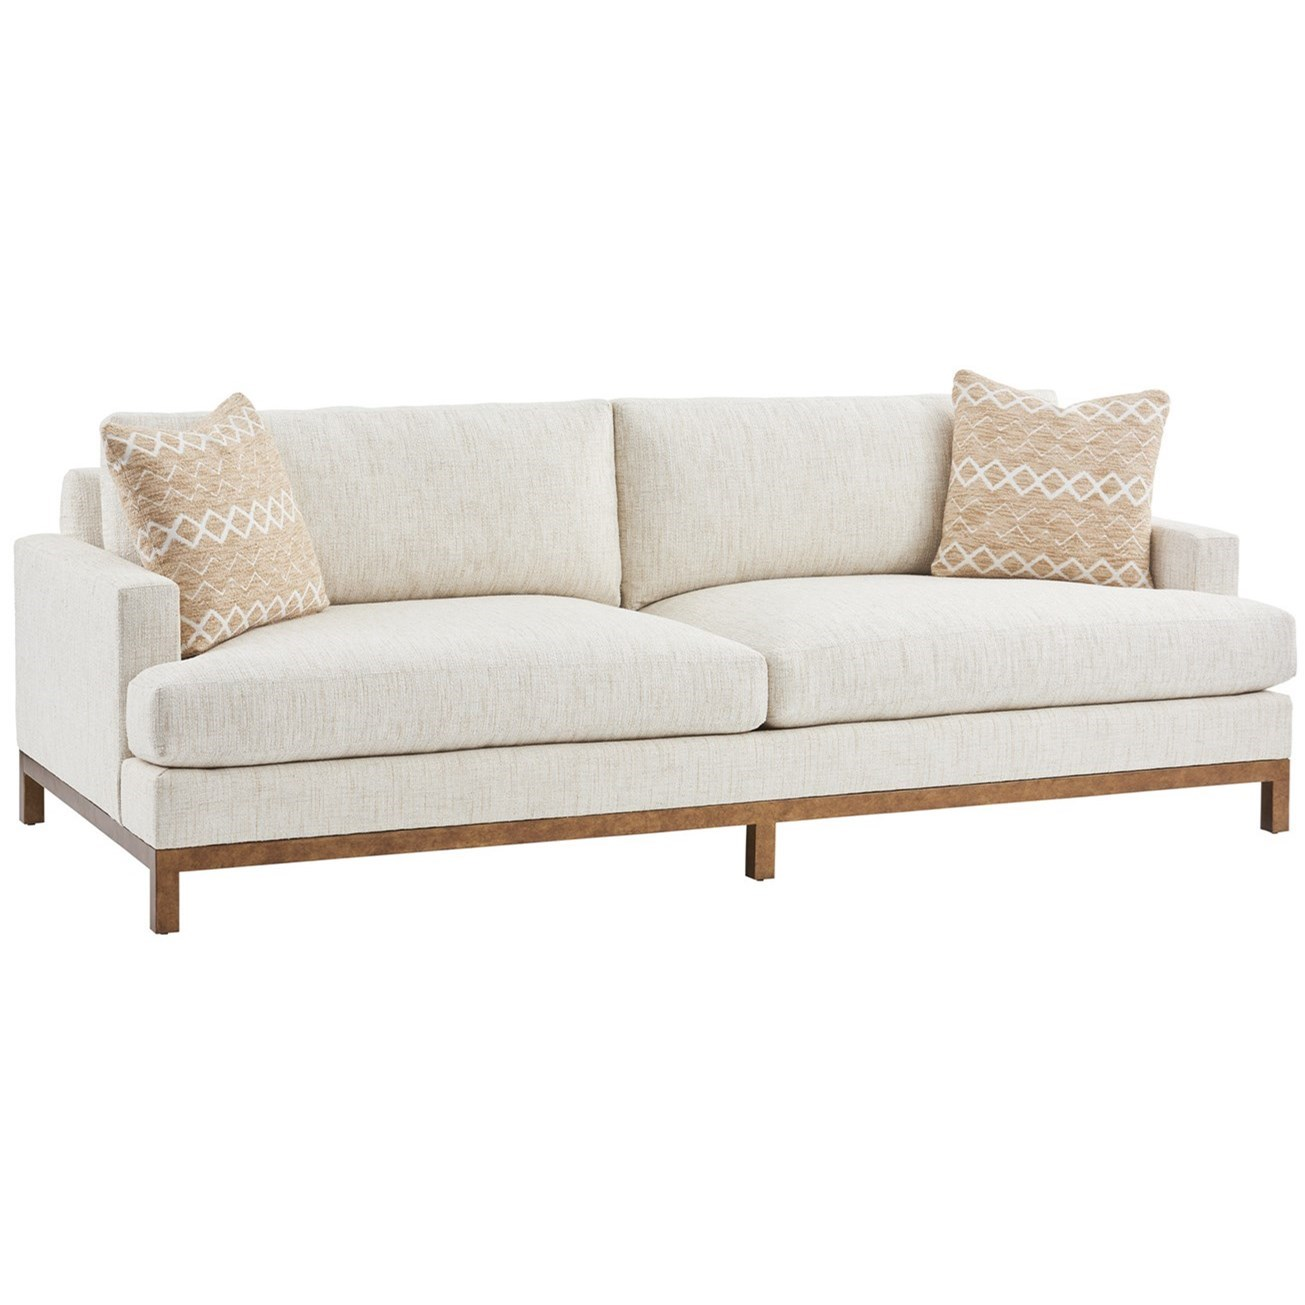 Barclay Butera Upholstery Horizon Sofa w/ Calais Brass Metal Base by Barclay Butera at Baer's Furniture